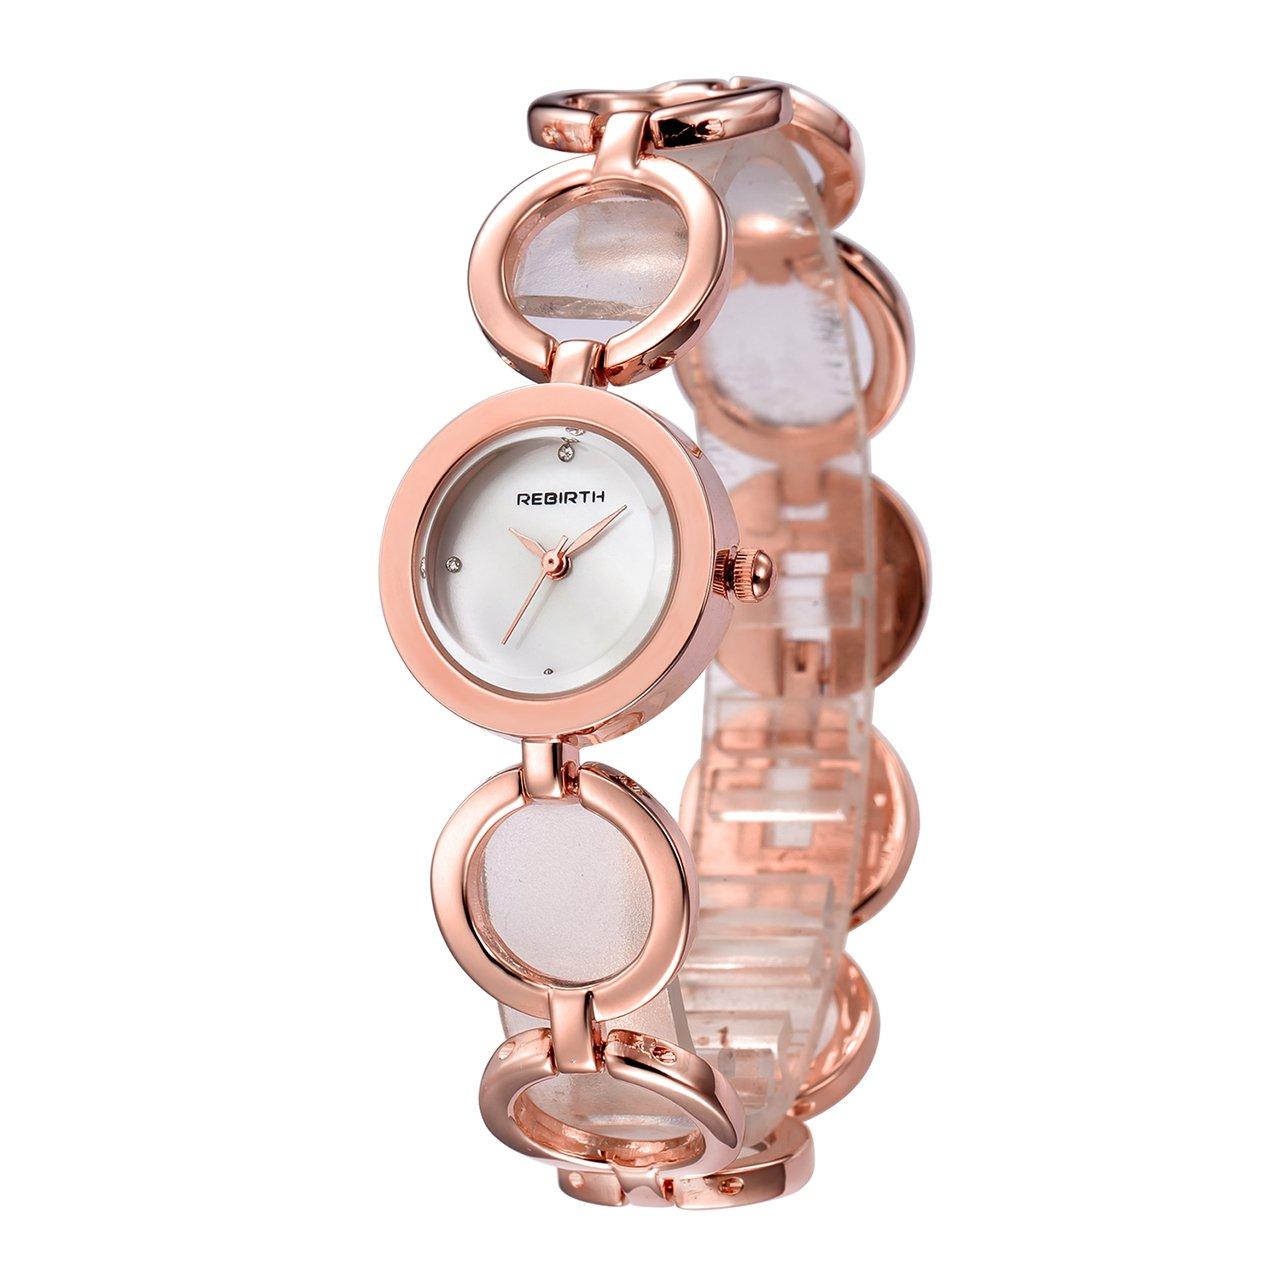 Top Plaza Women Fashion Luxury Quartz Analog Bangle Cuff Dress Barcelet Wrist Watch with Circle Band,Rhinestone Hour Marker,Jewelry Hidden Buckle(Rose Gold Tone)